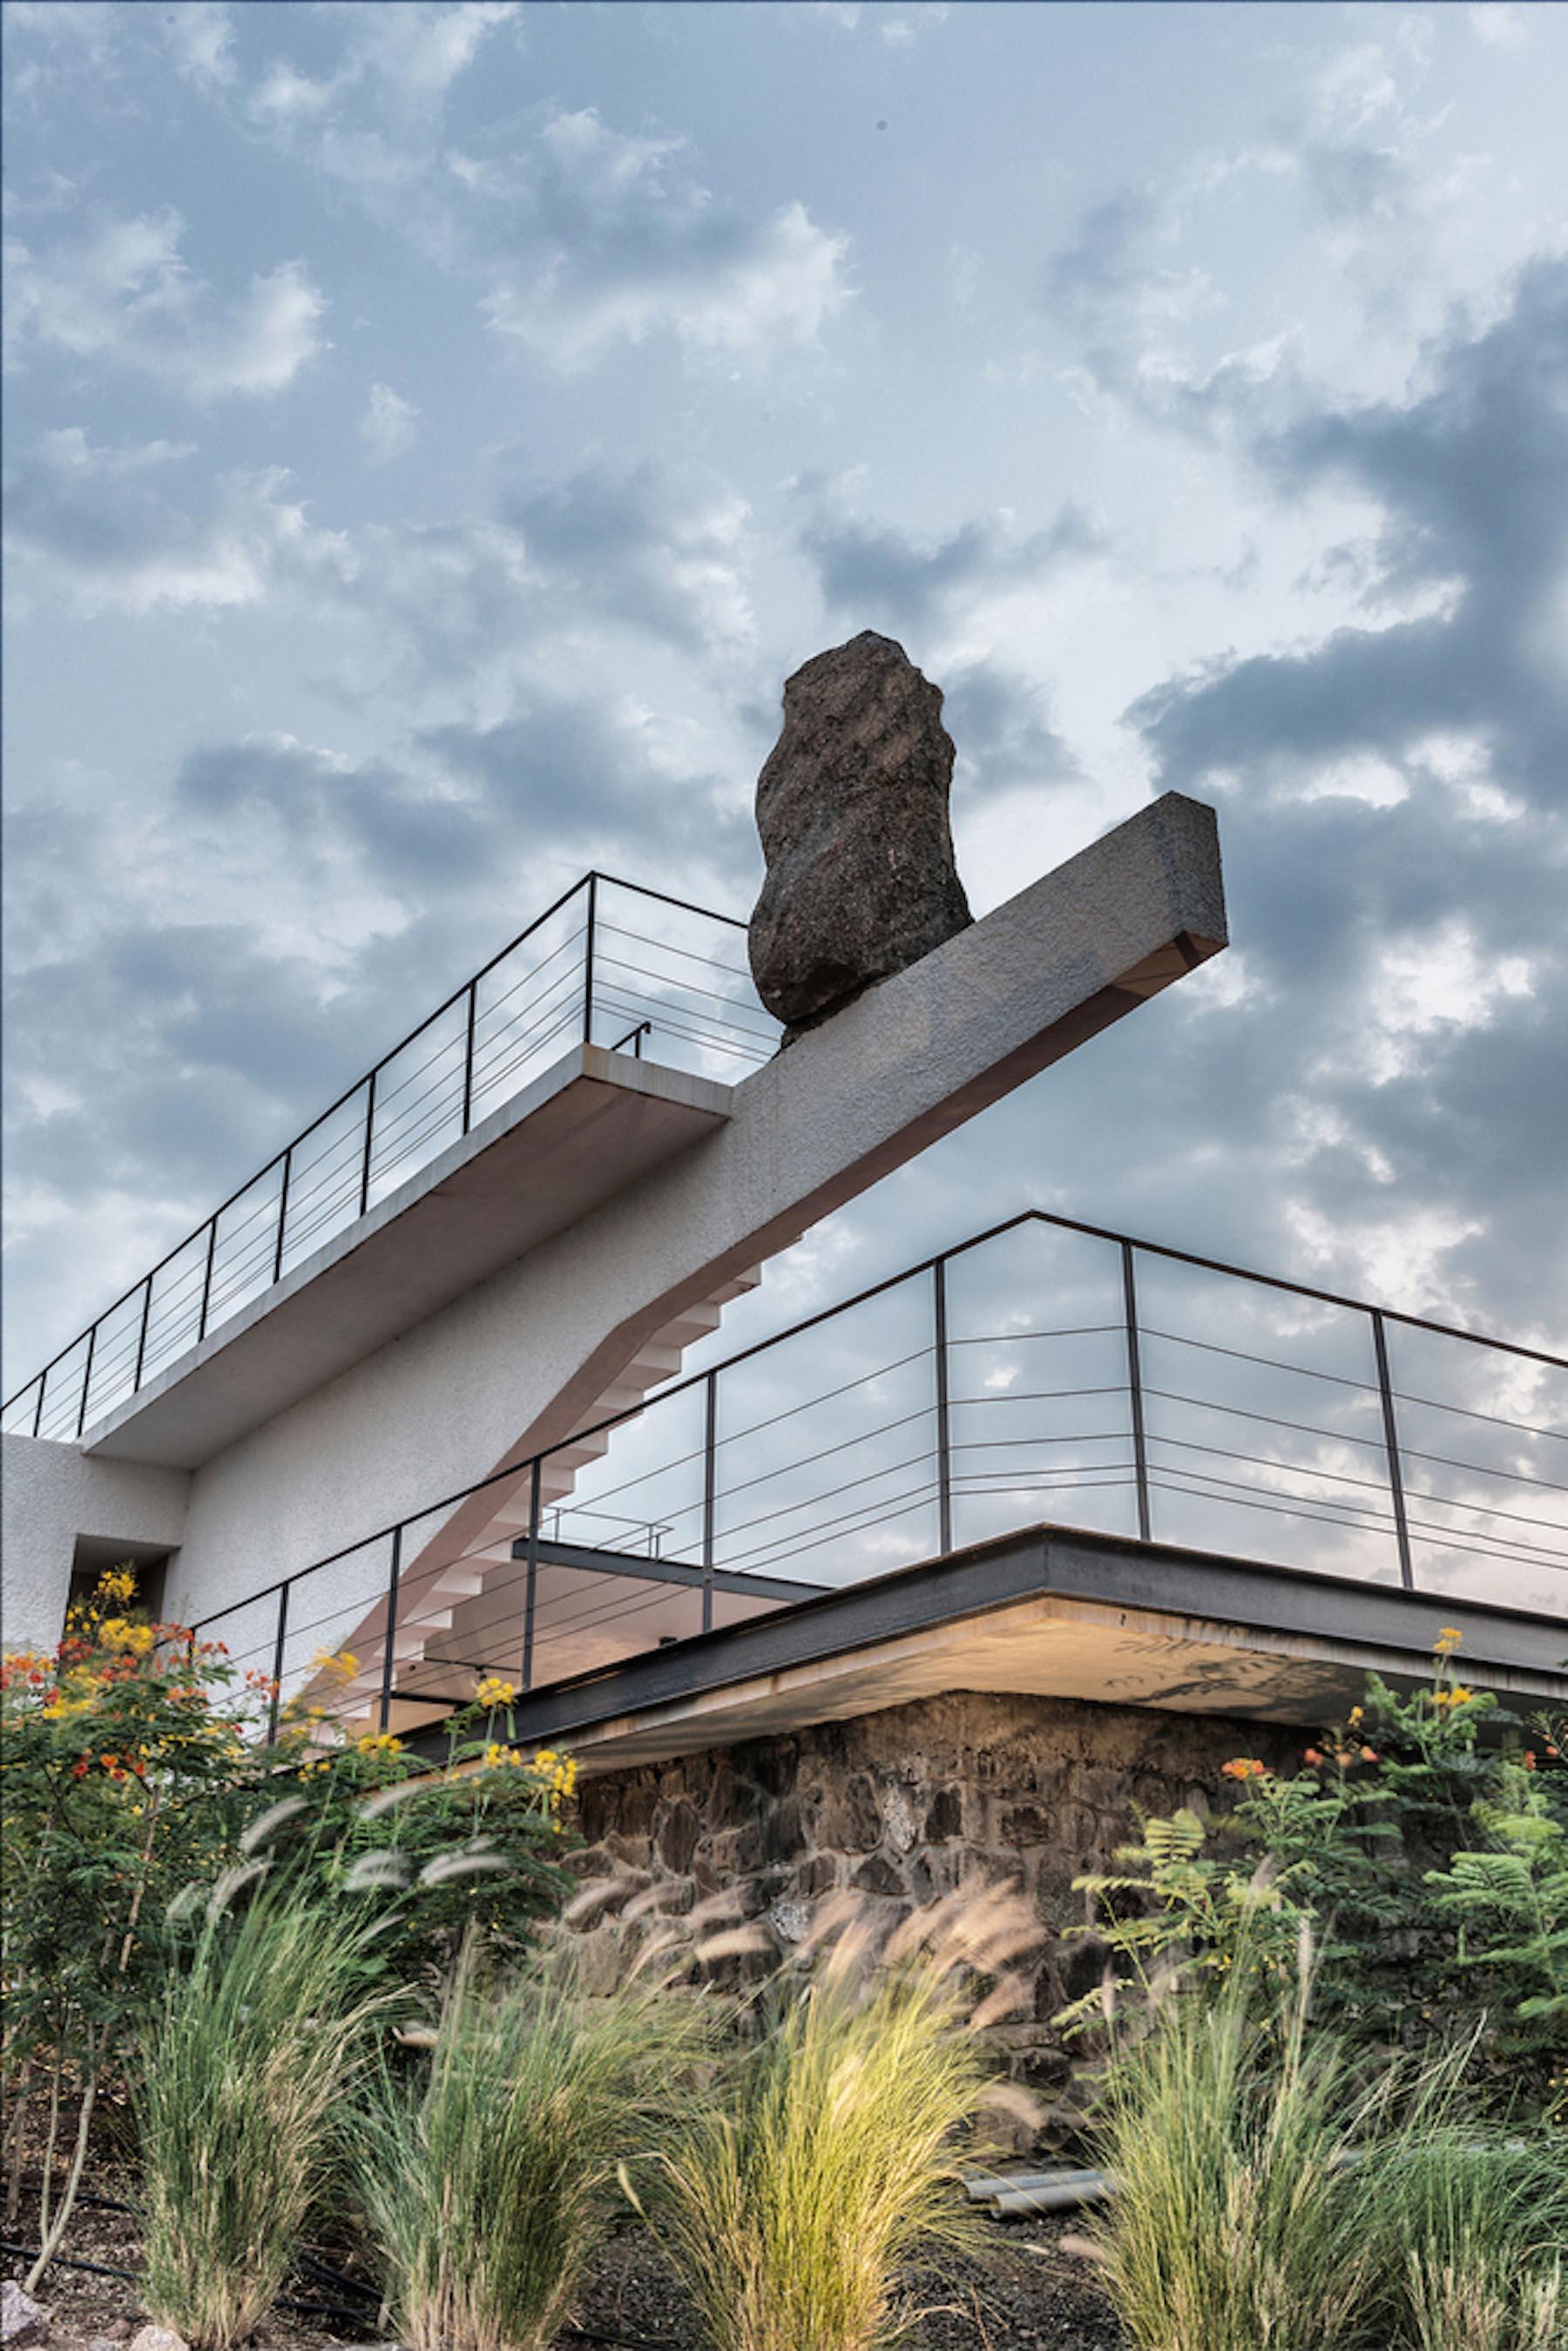 iGNANT-Architecture-Spasm-Design-The-Soaring-Rock-04